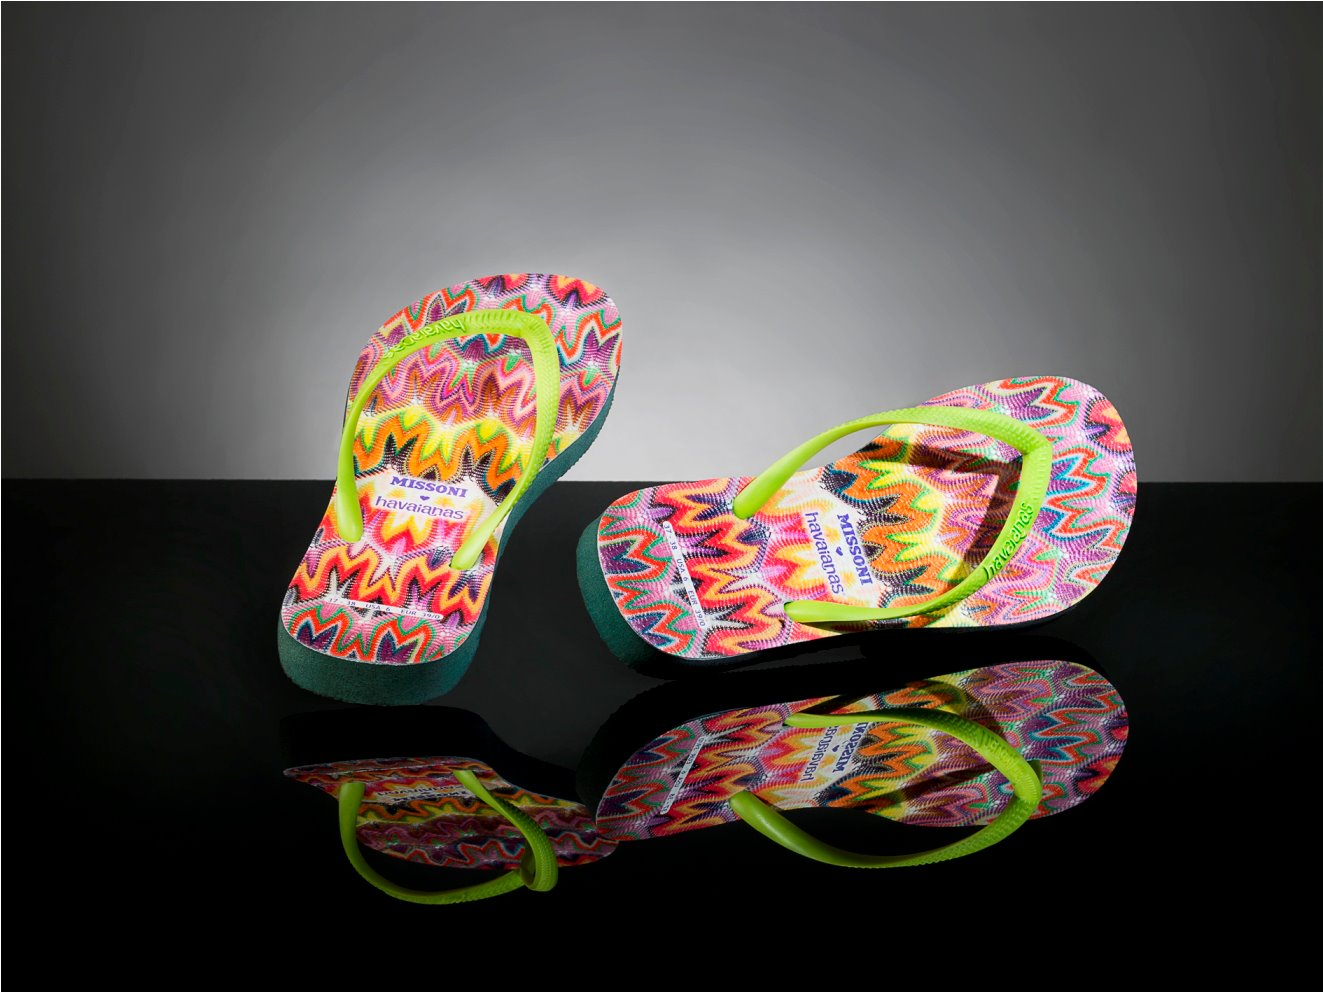 b75edcb0942b0c ... design house Missoni and Brazilian flip-flop brand Havaianas